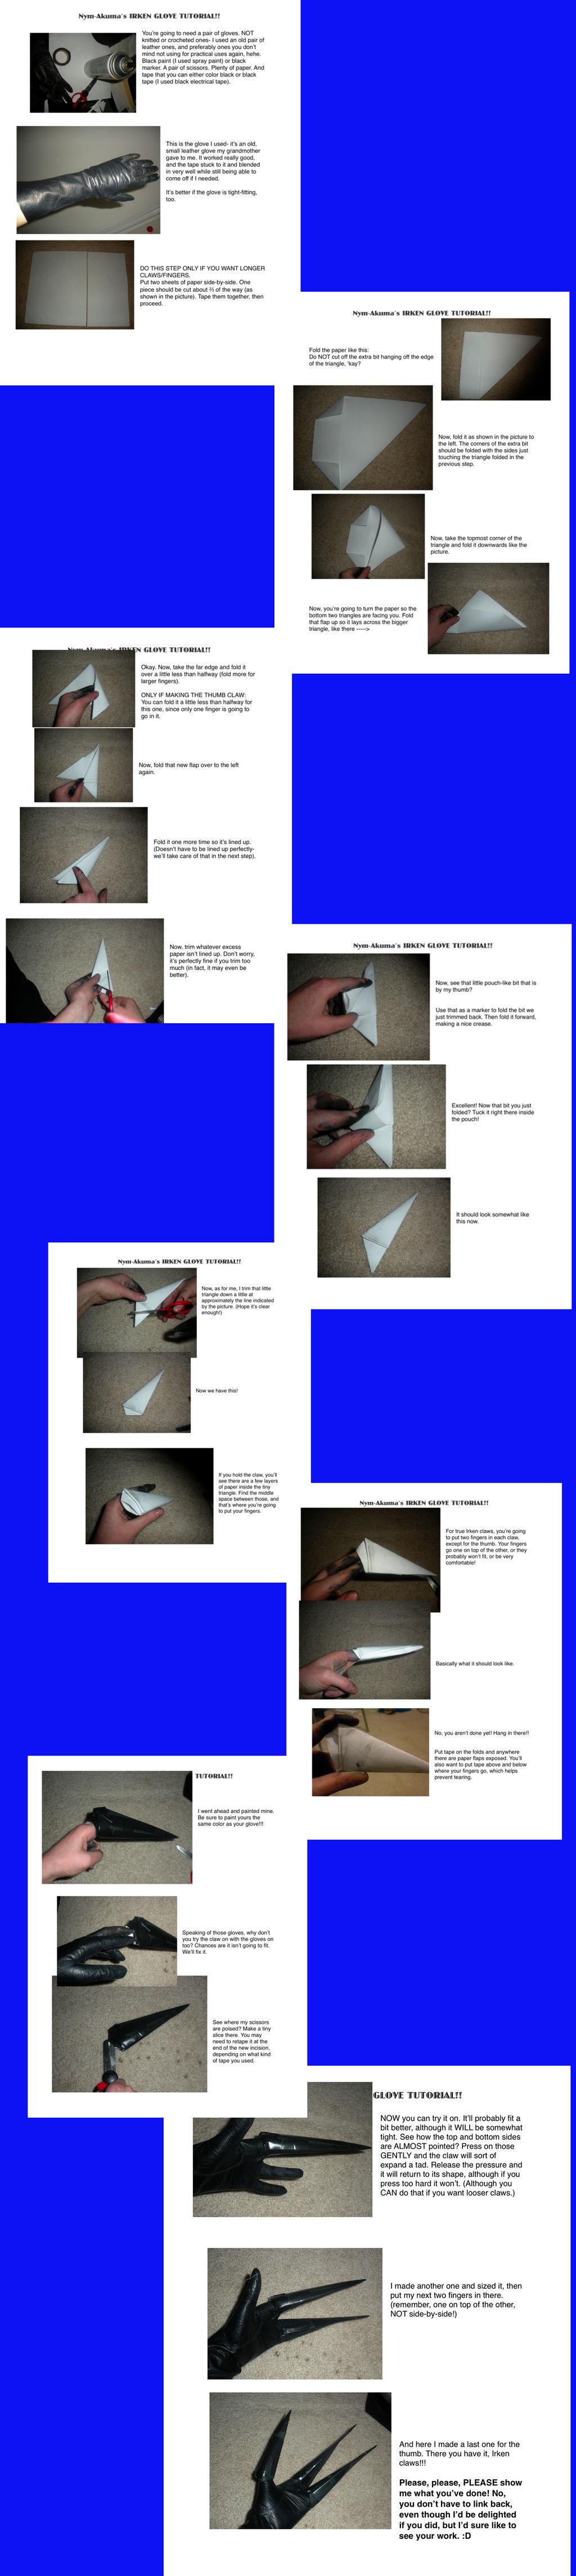 Irken 3-Finger Glove Tutorial